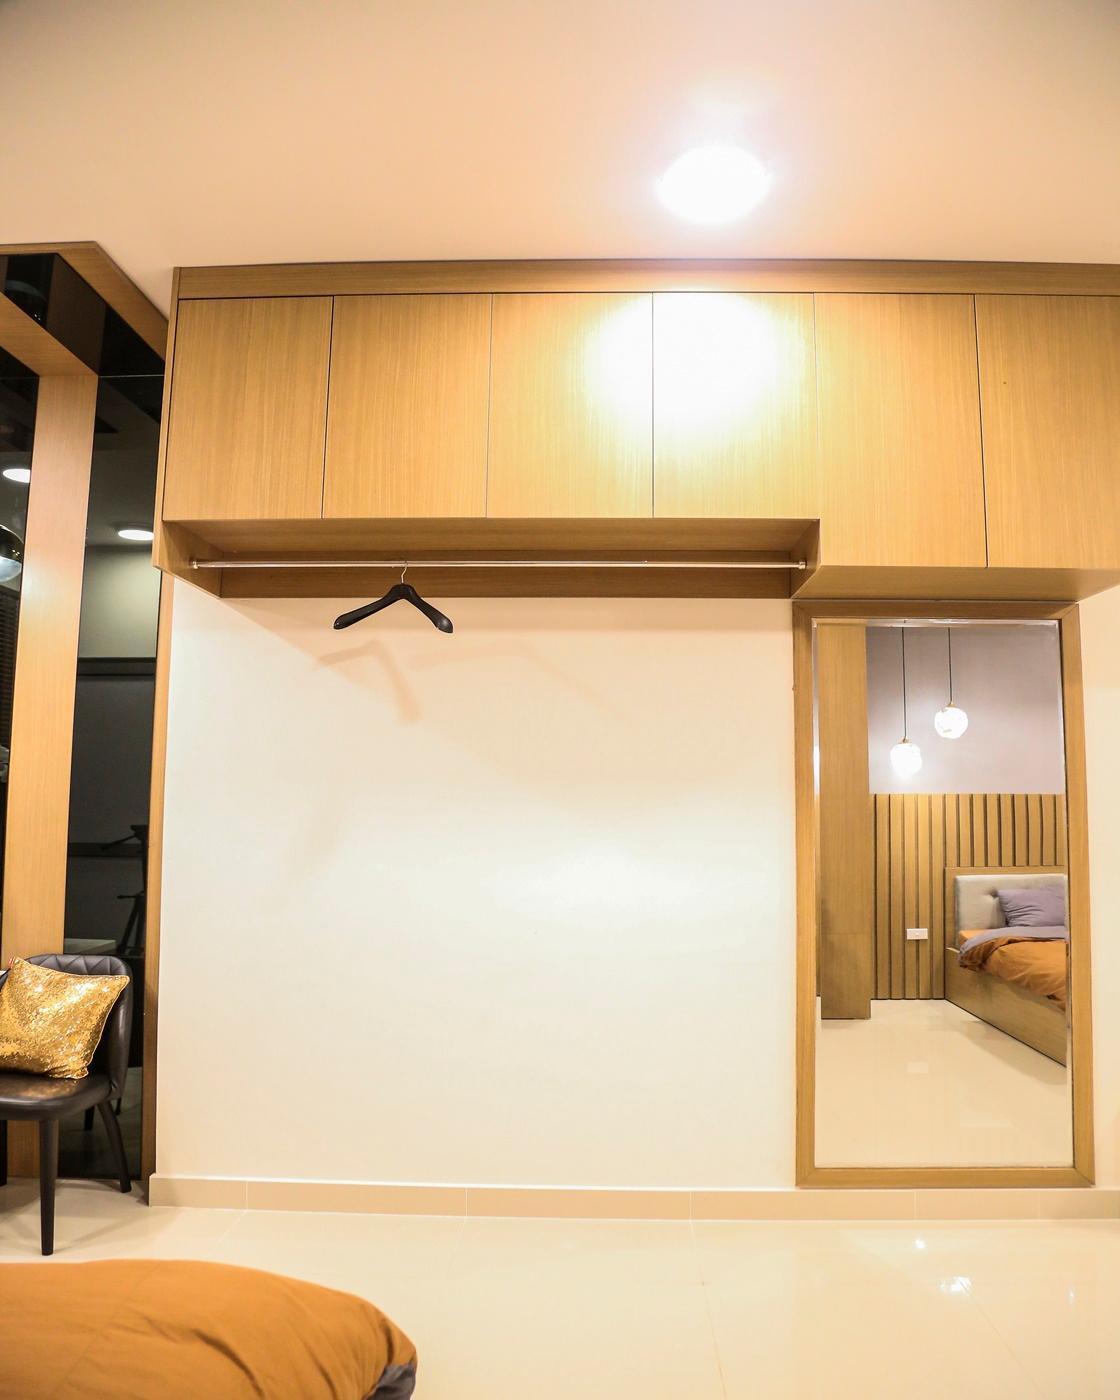 SStay CBD Family 2 Bed Condotel   RiverGate